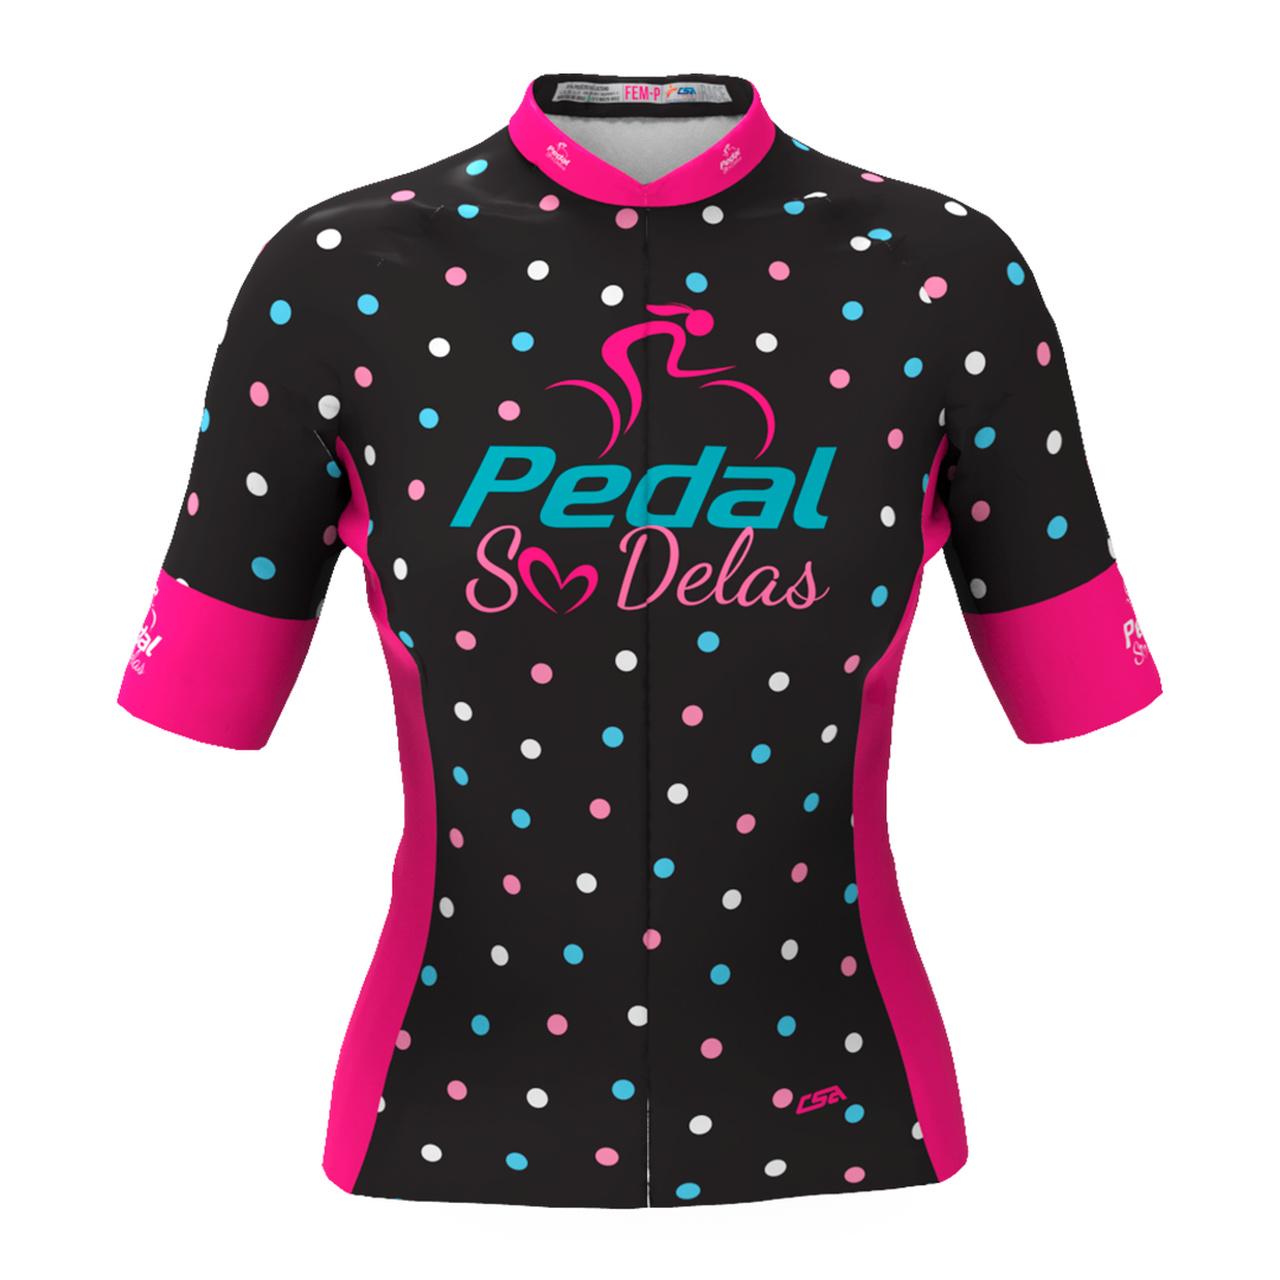 Camisa Ciclista Tour Pedal Só Delas Feminina Preto-Poá Manga Longa